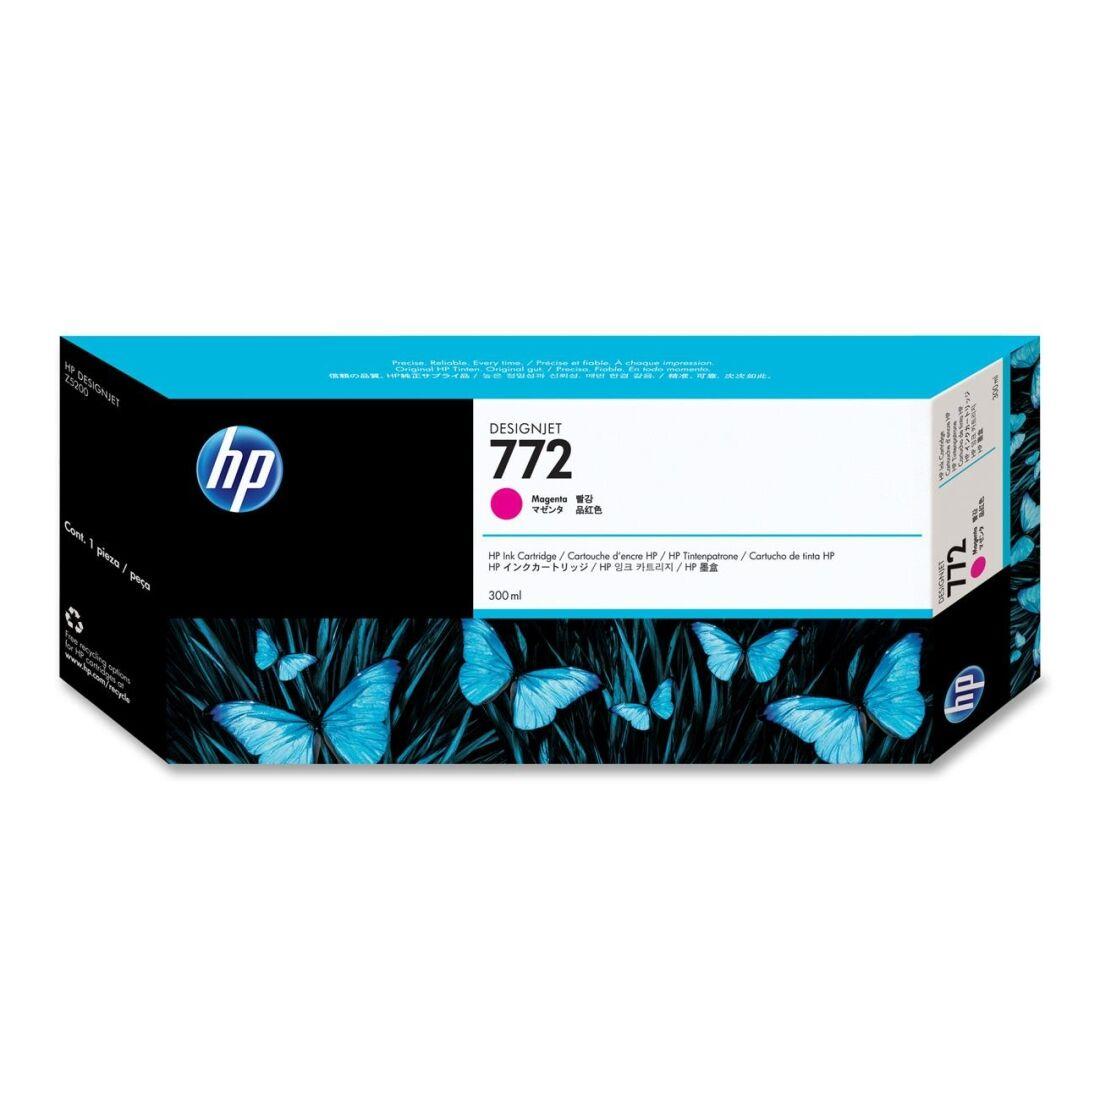 HP Cartouche encre Magenta n°772 - 300 ml